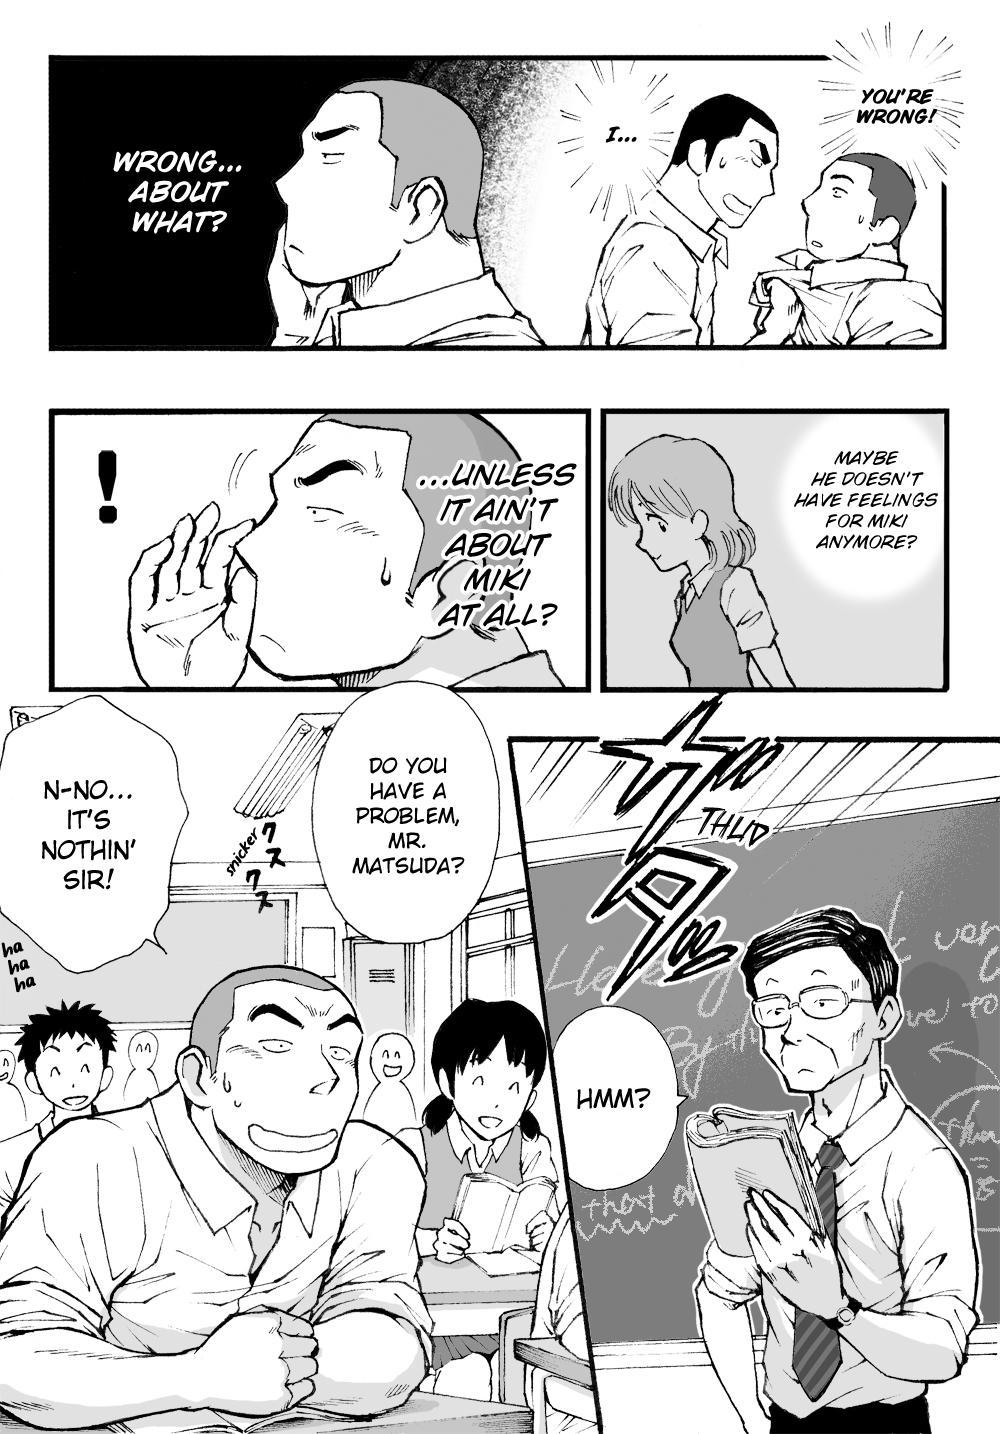 [Akahachi] Motemote Yakyuubu Otoko [Kouhen] | Popular Baseball Club Boys (Part Two) [English] [Papatez] 2